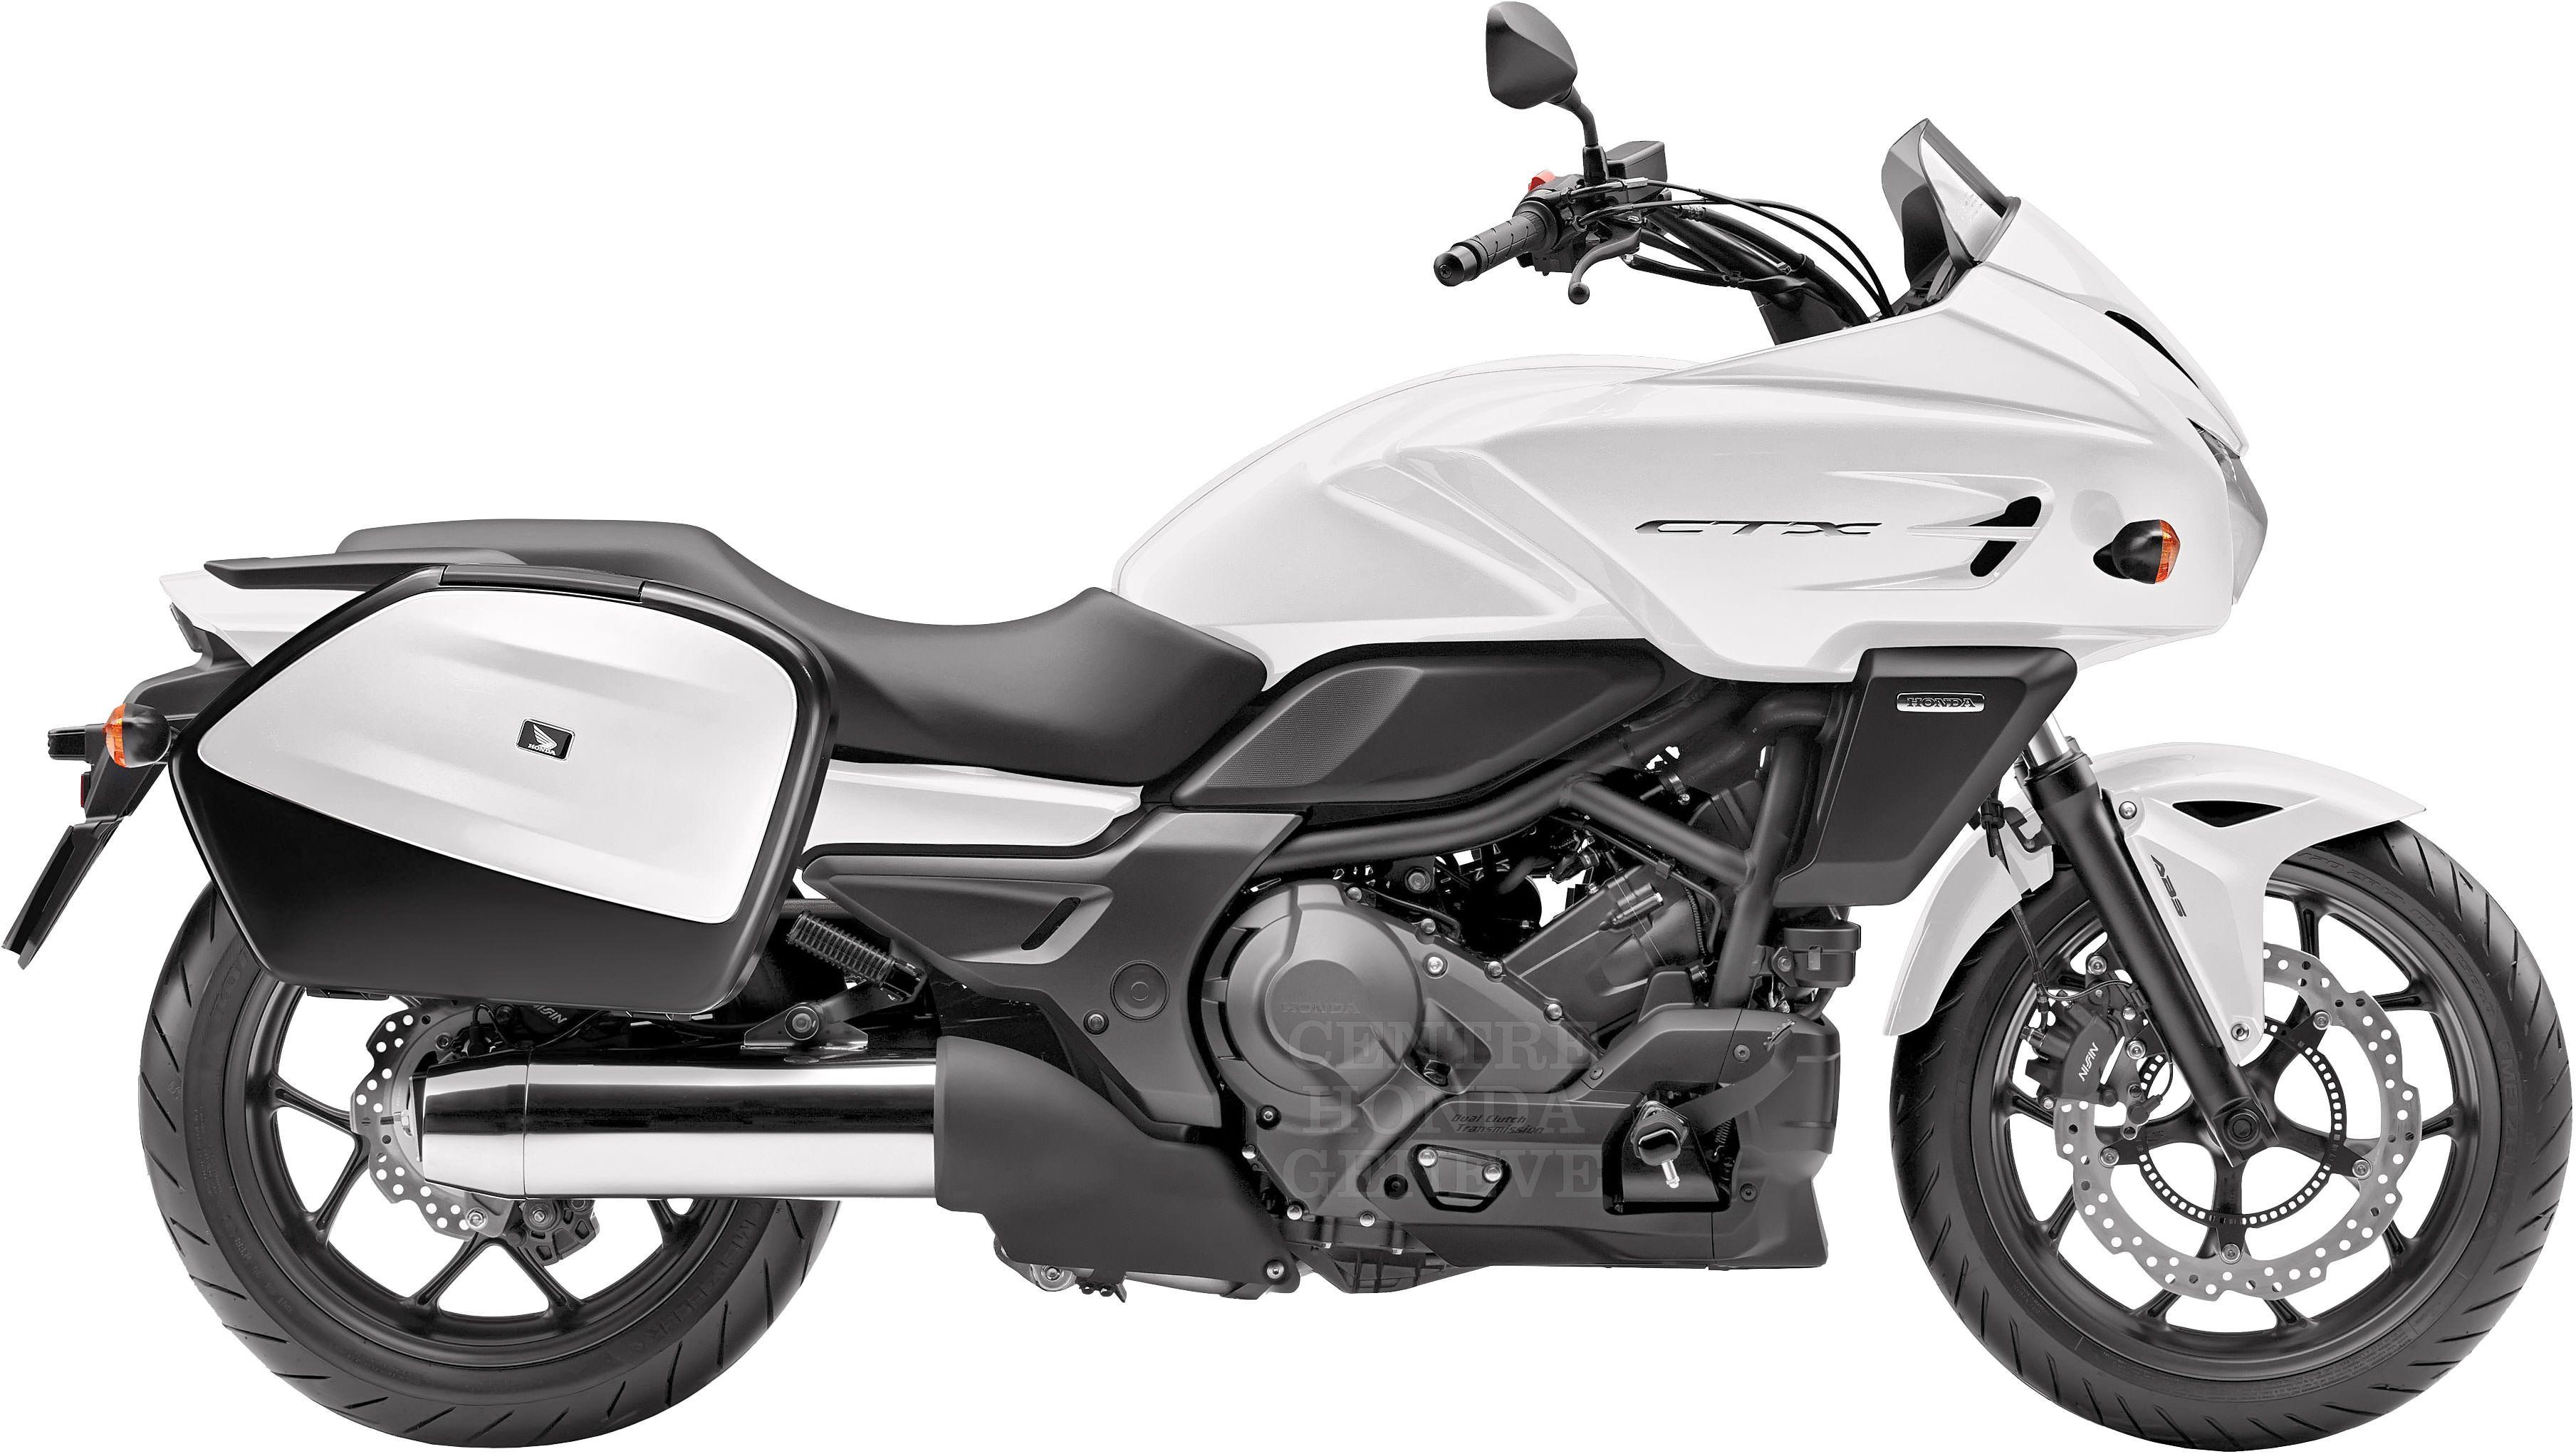 My Brand New Ride A 2014 Honda Ctx700 Manual Motorcycles